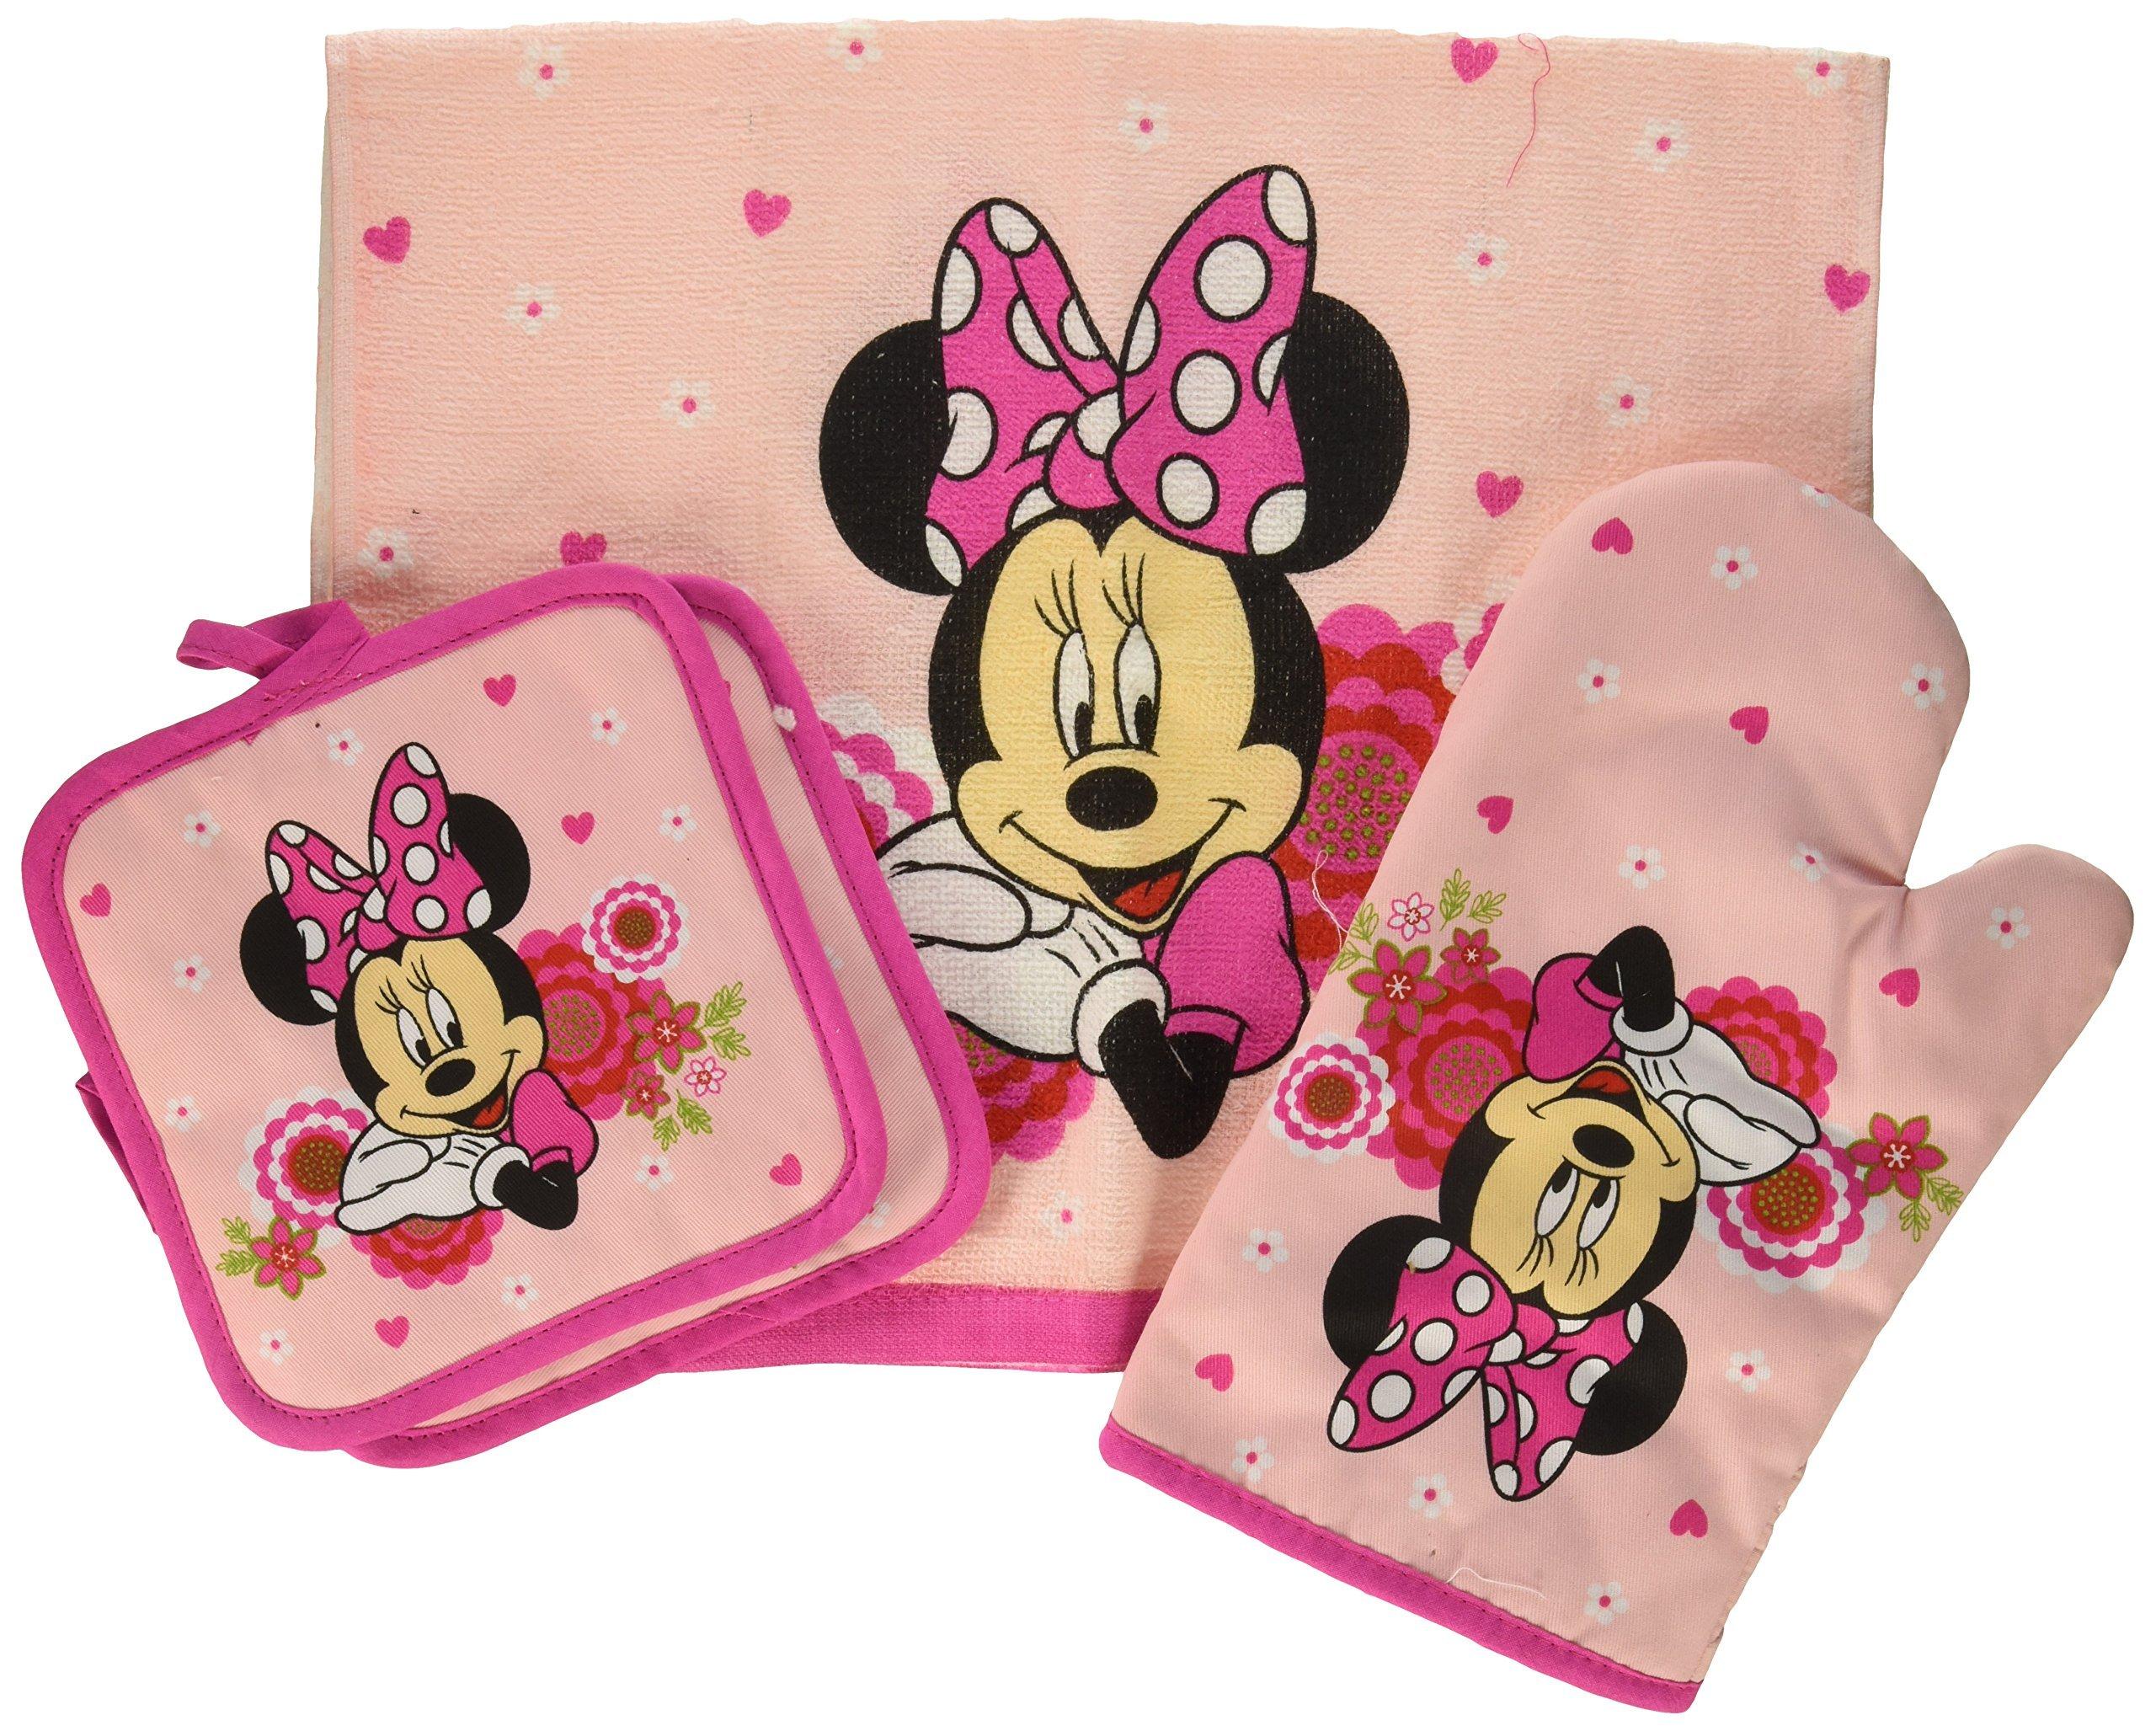 Disney Minnie Mouse Pink Floral 4-pc Kitchen Set: Towel, Oven Mitt & 2 Pot Holders